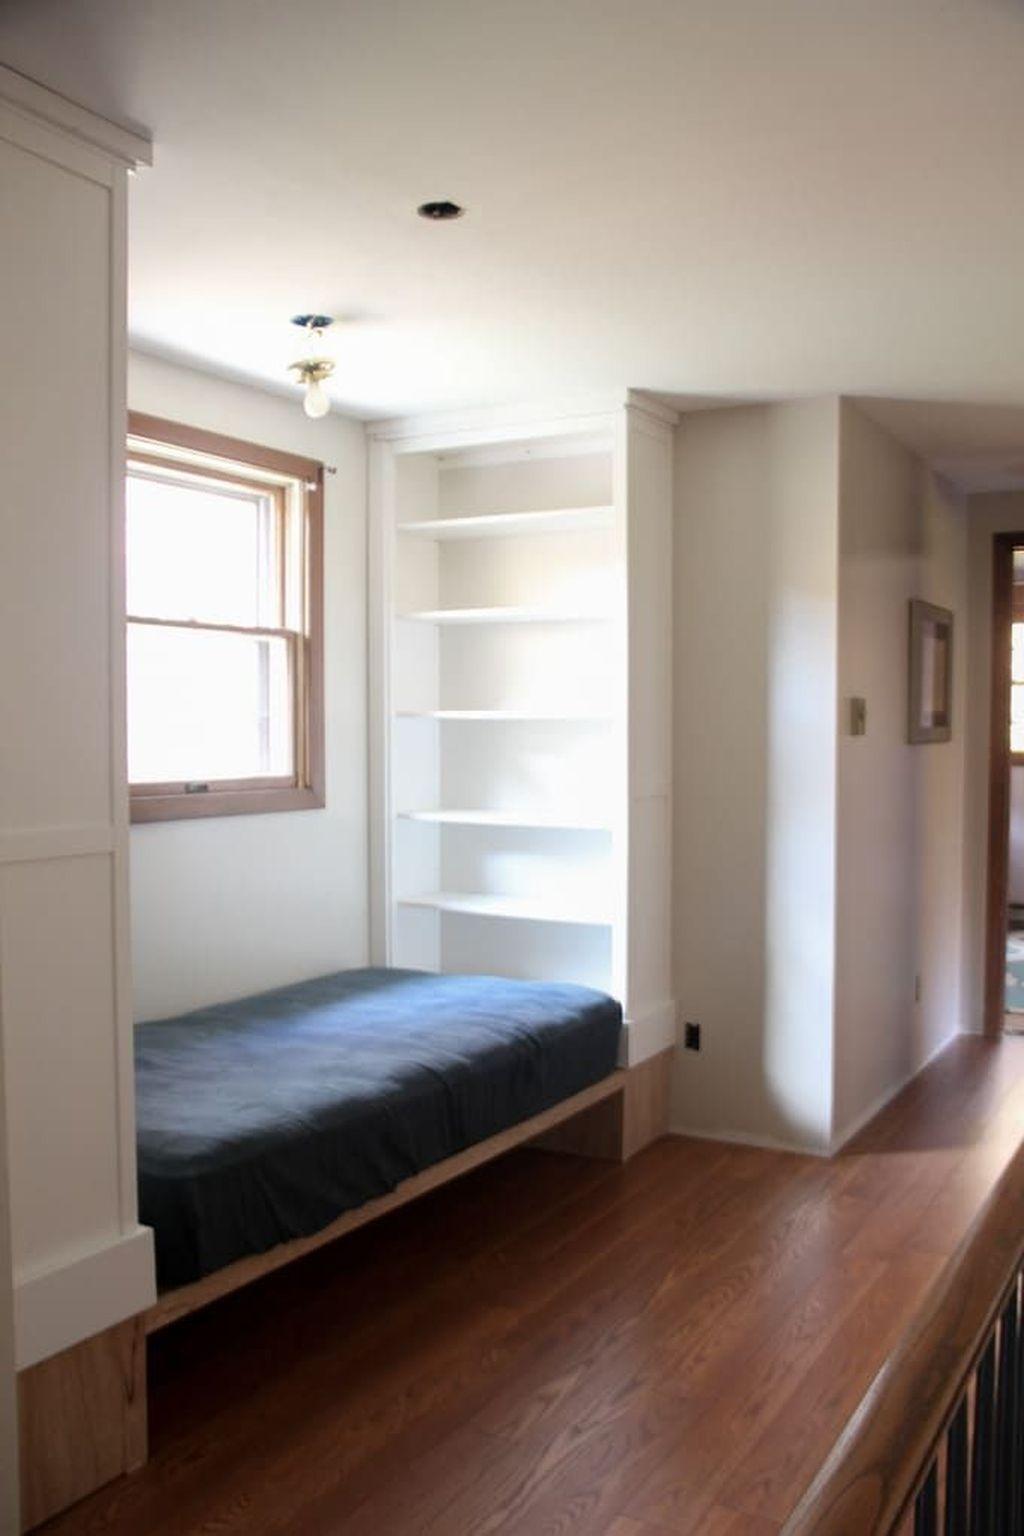 20+ Latest Diy Bookshelf Design Ideas For Room Ikea